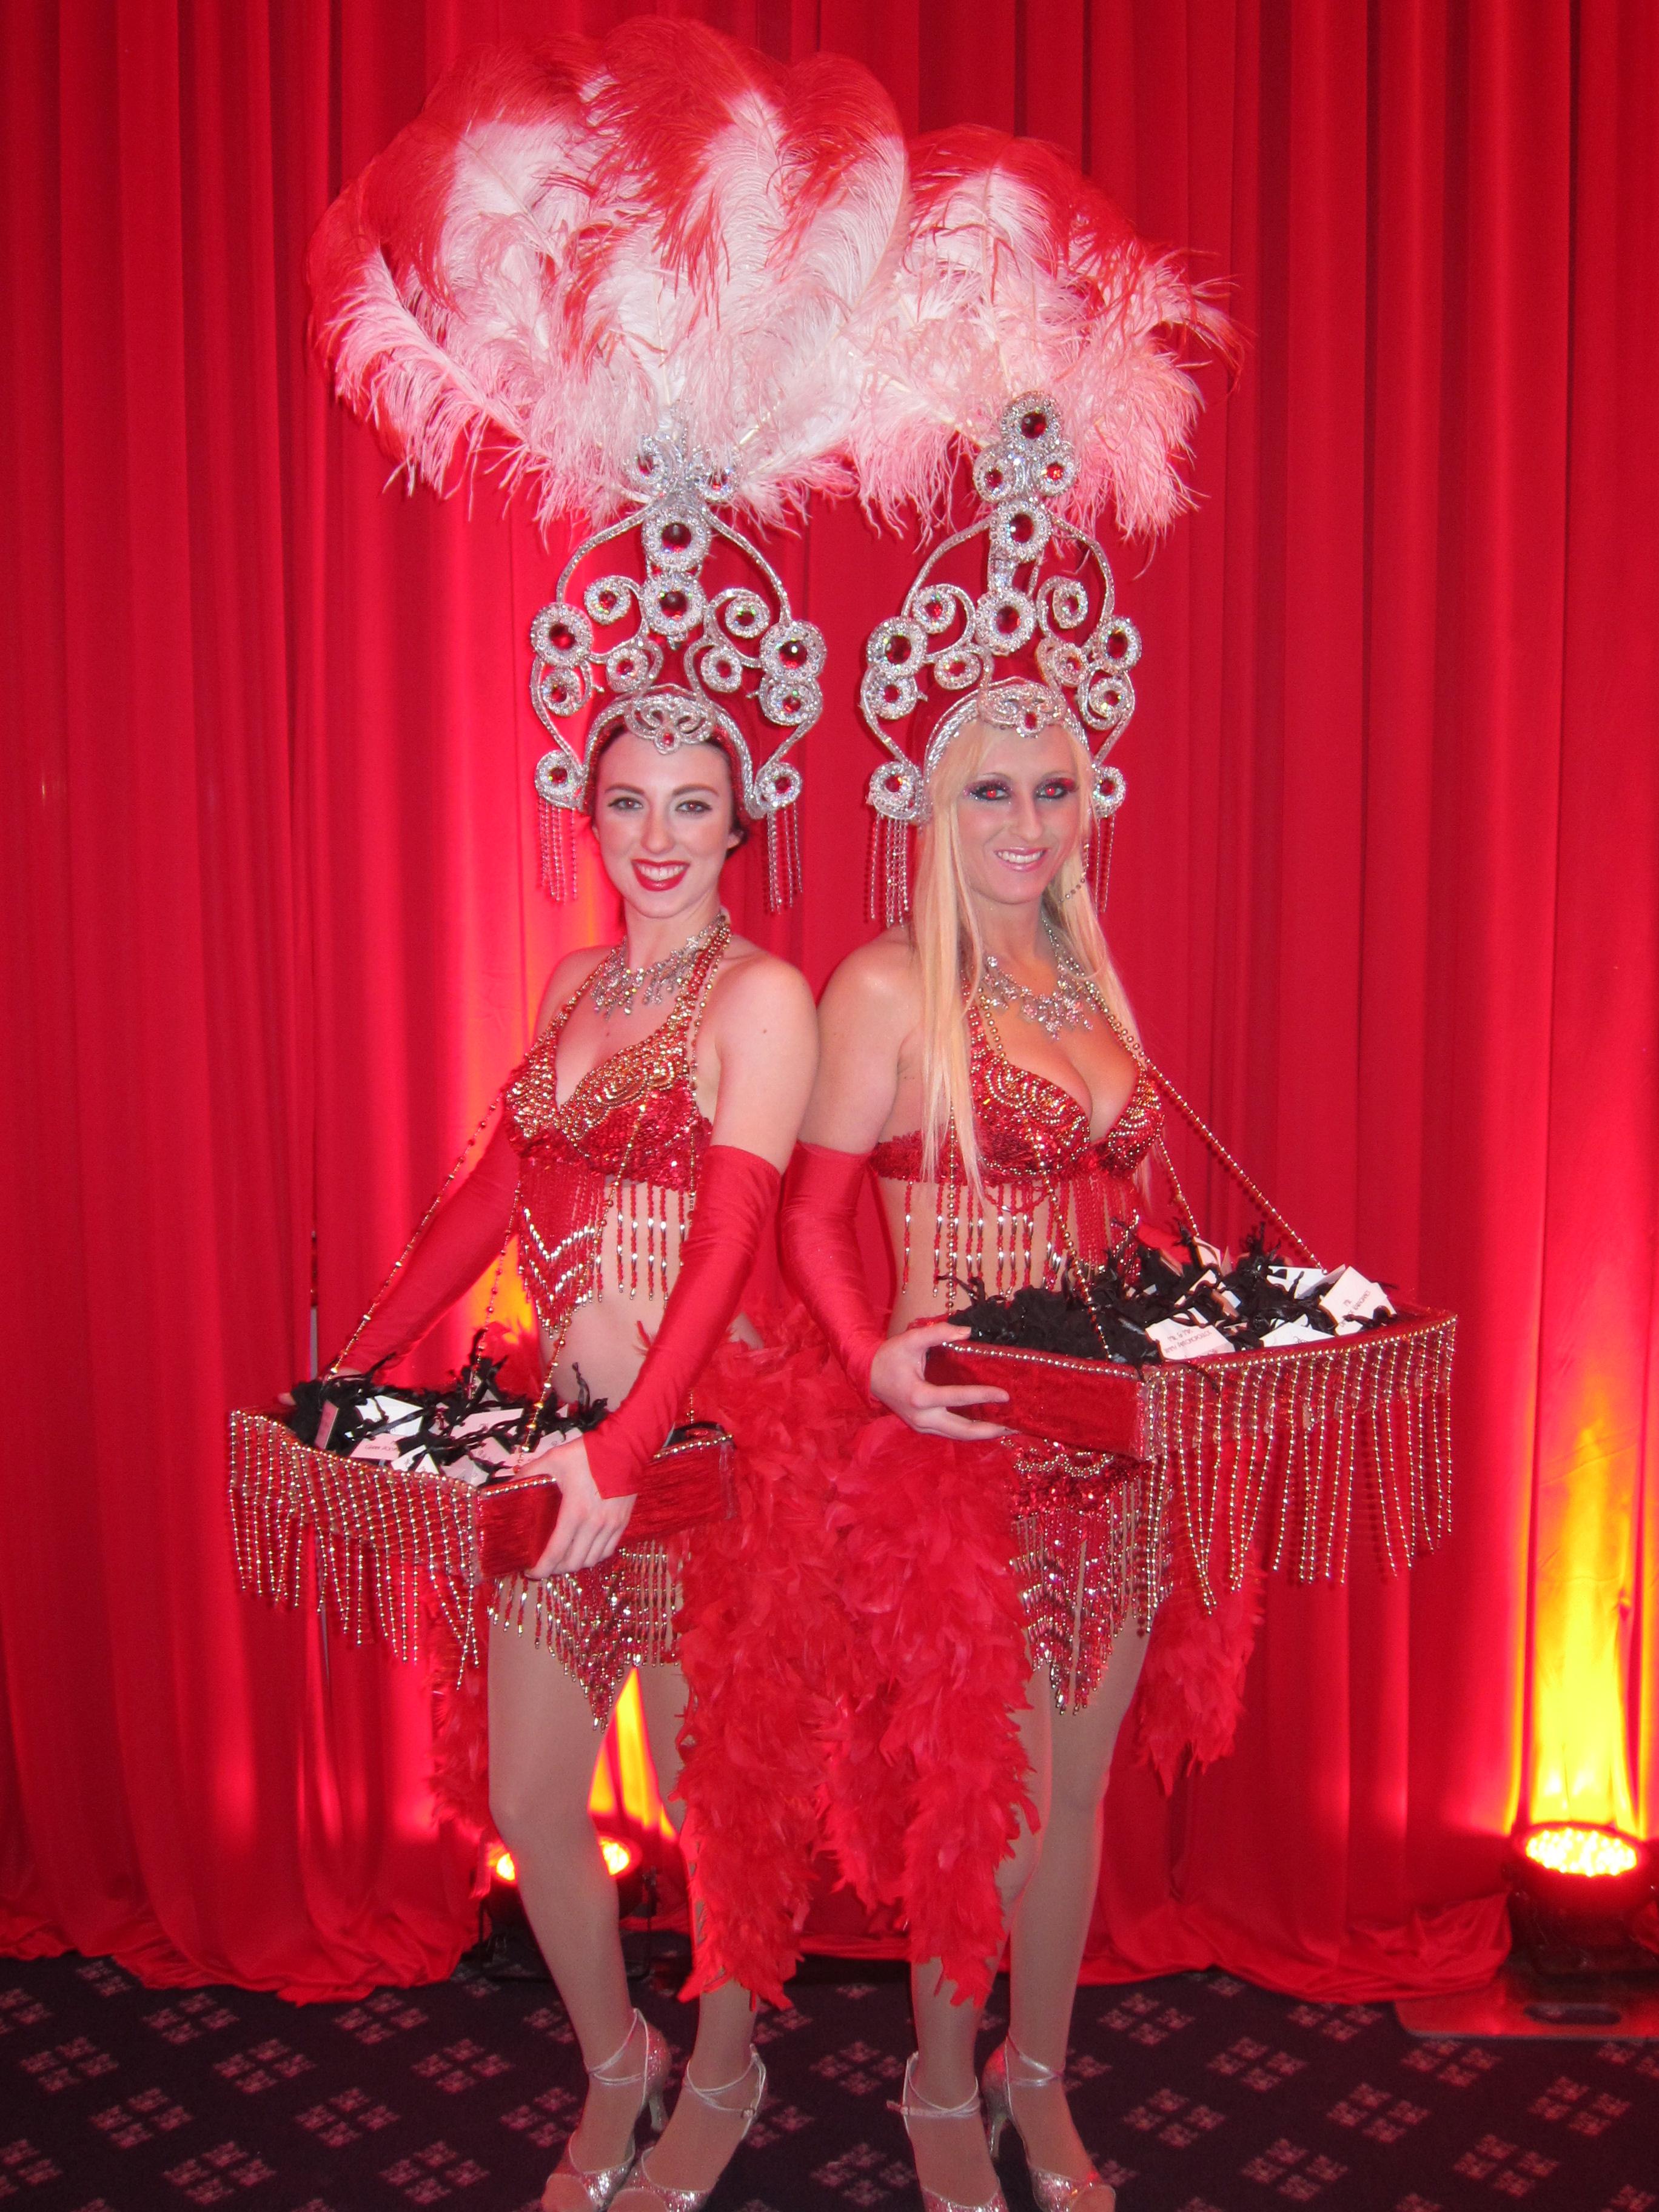 Las Vegas Showgirls Red Drapery